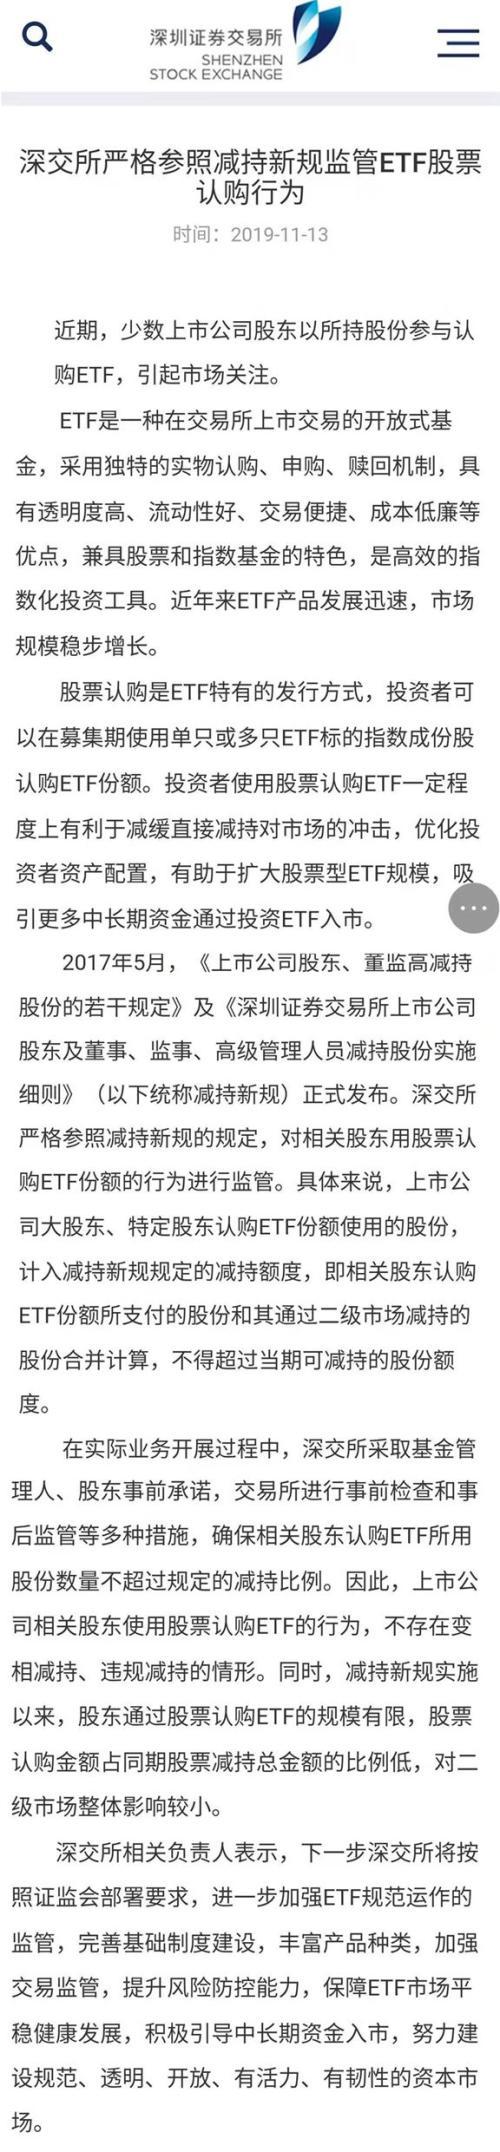 「k8彩票官网体育app」第七届亚洲杯拼字嘉年华总决赛在日本福冈完美收官